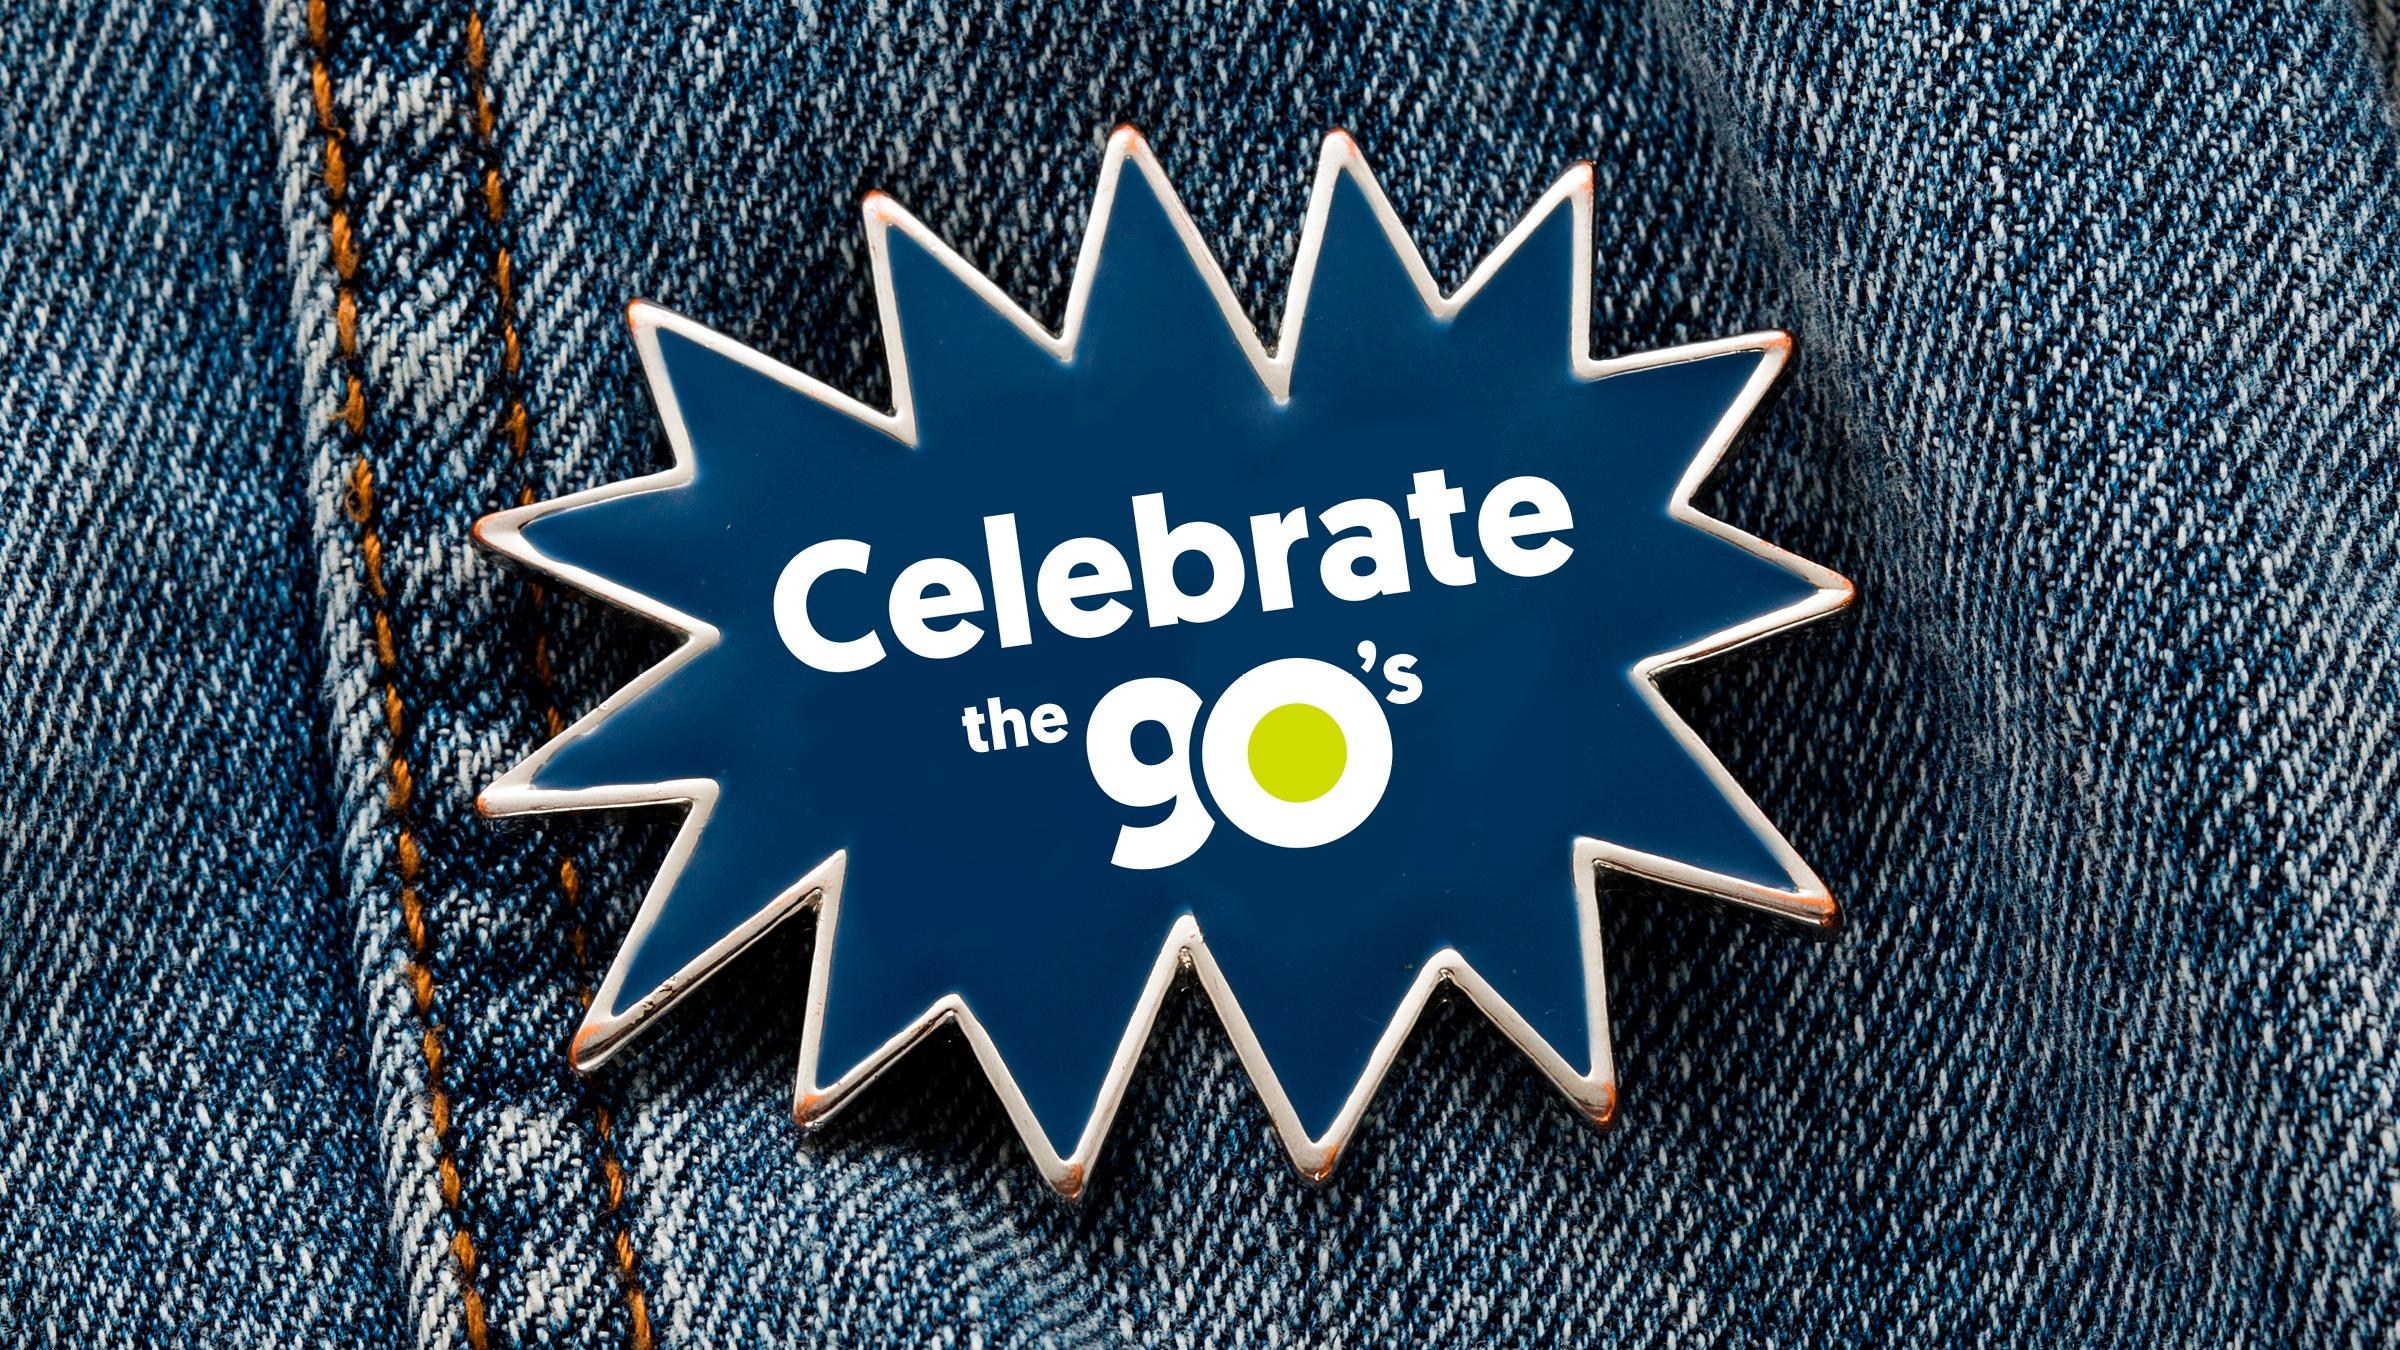 Celebrate90ies def